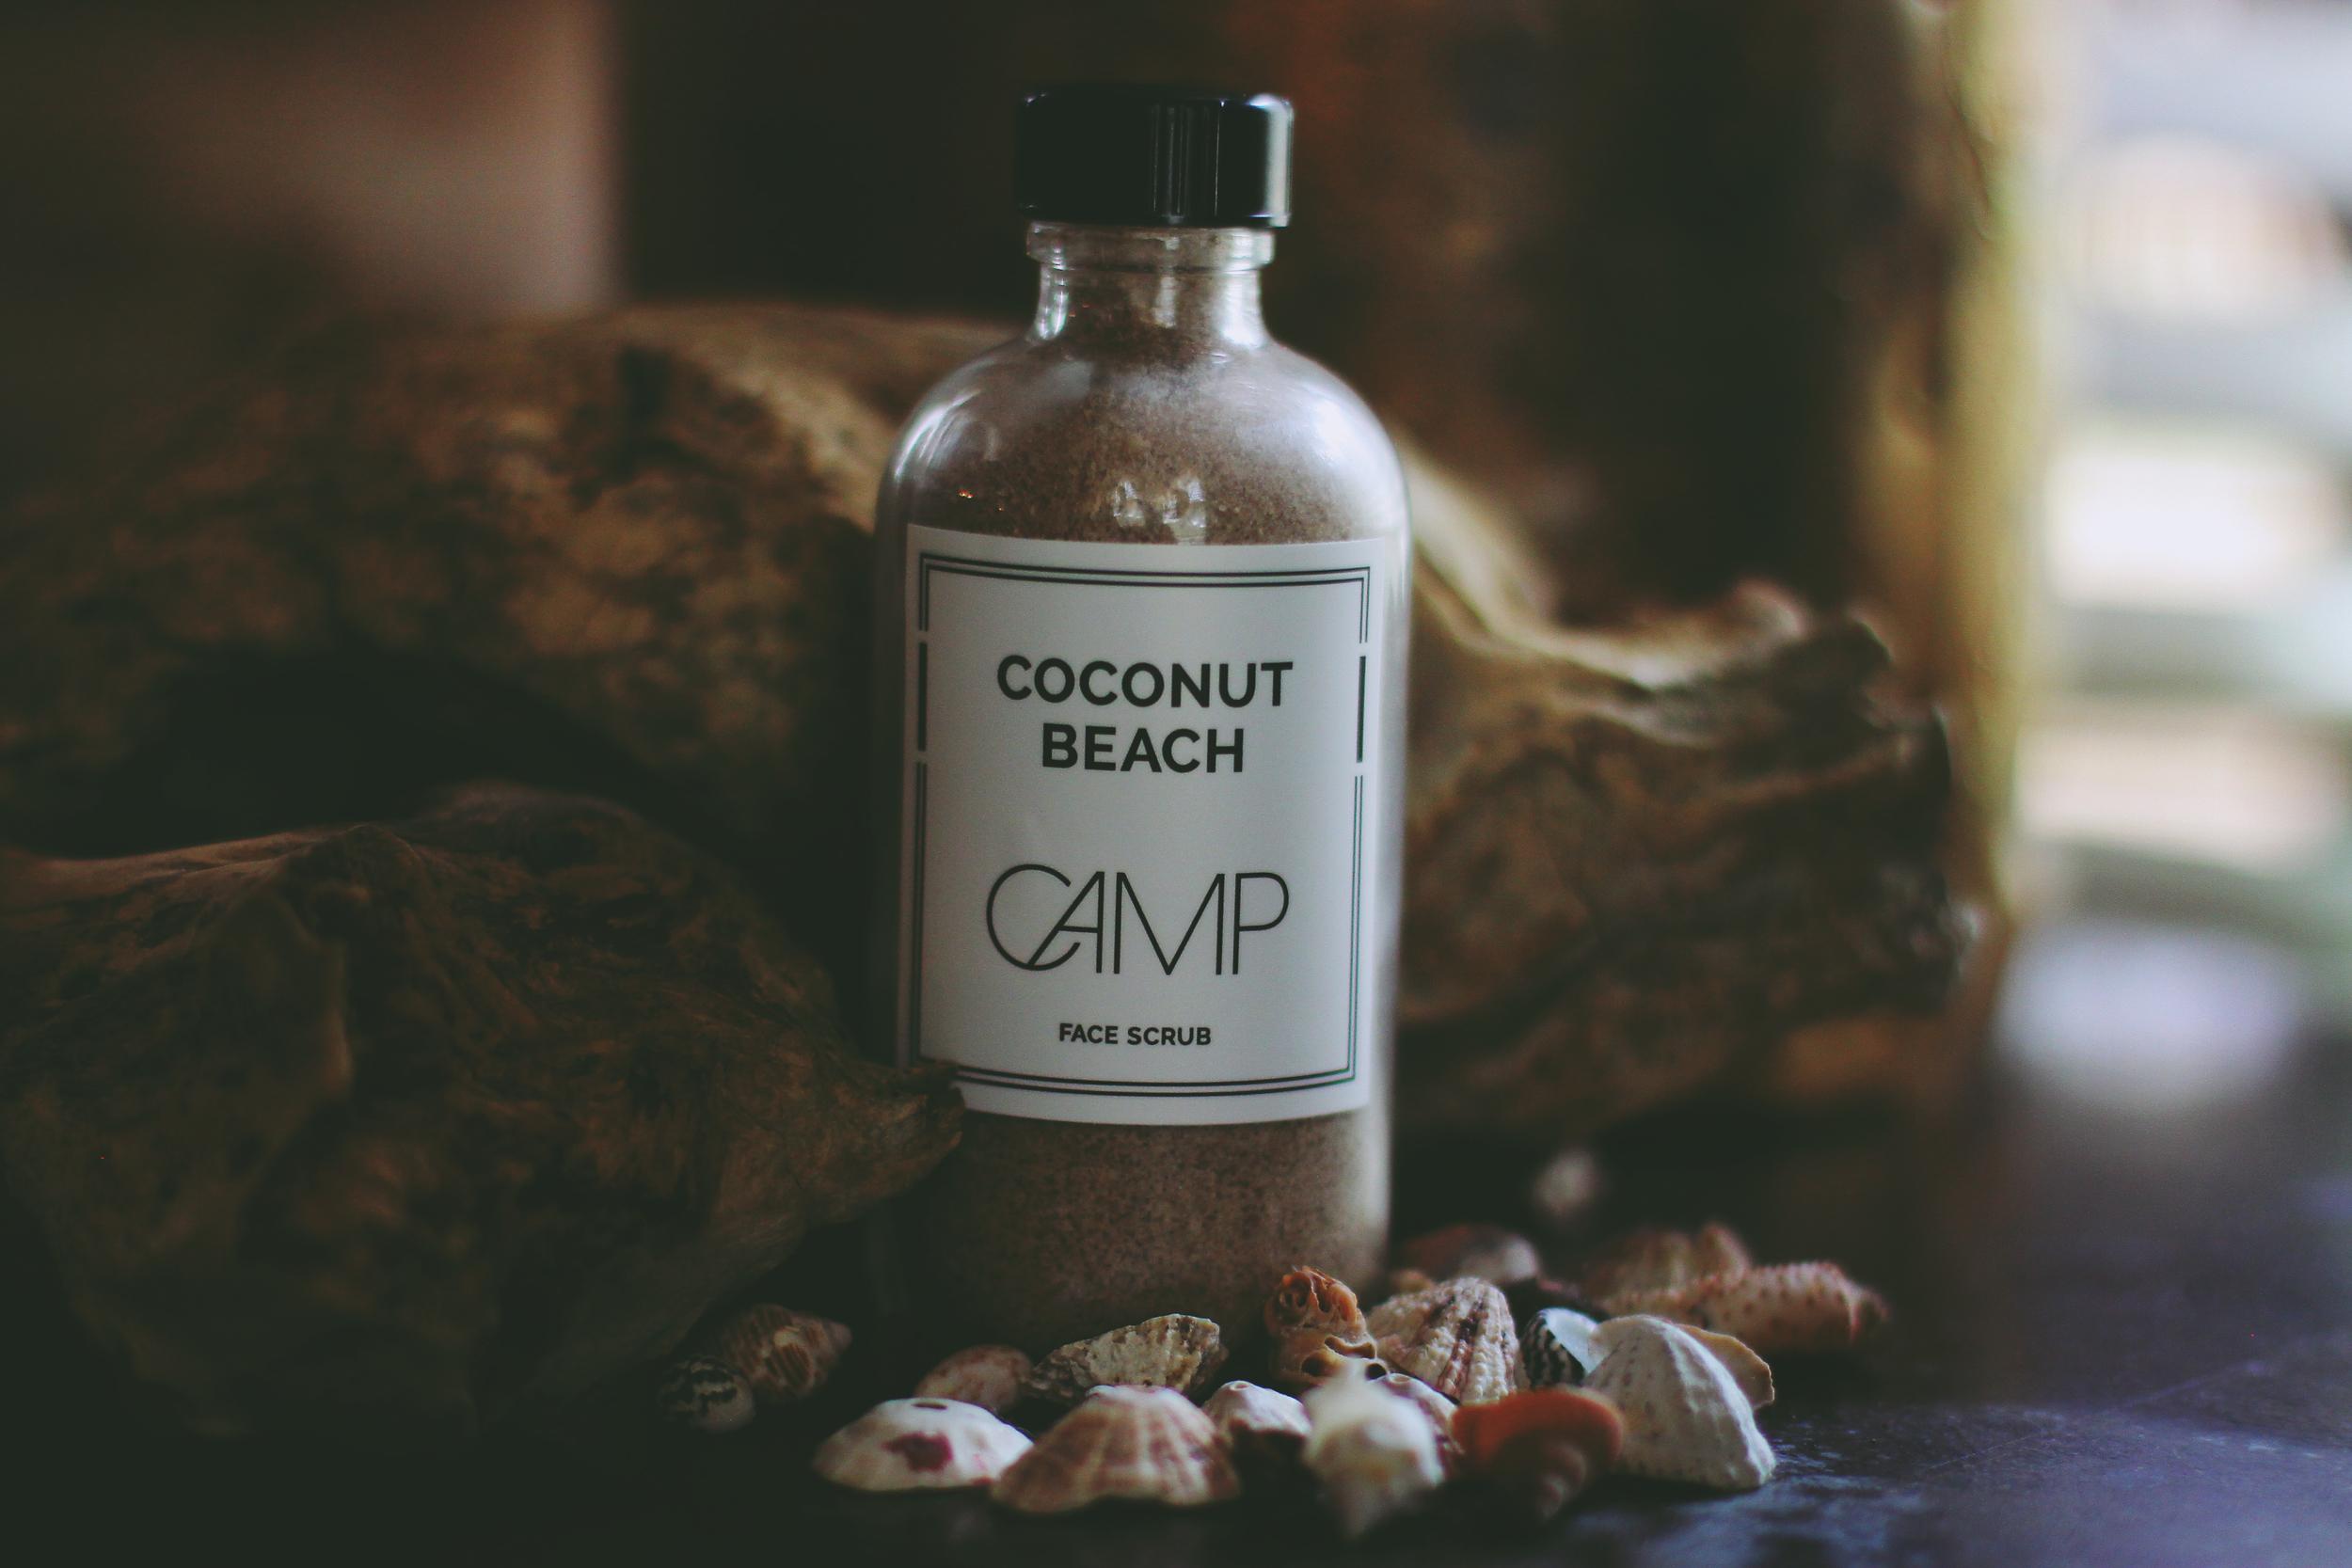 Camp Skincare via bohocollective.com